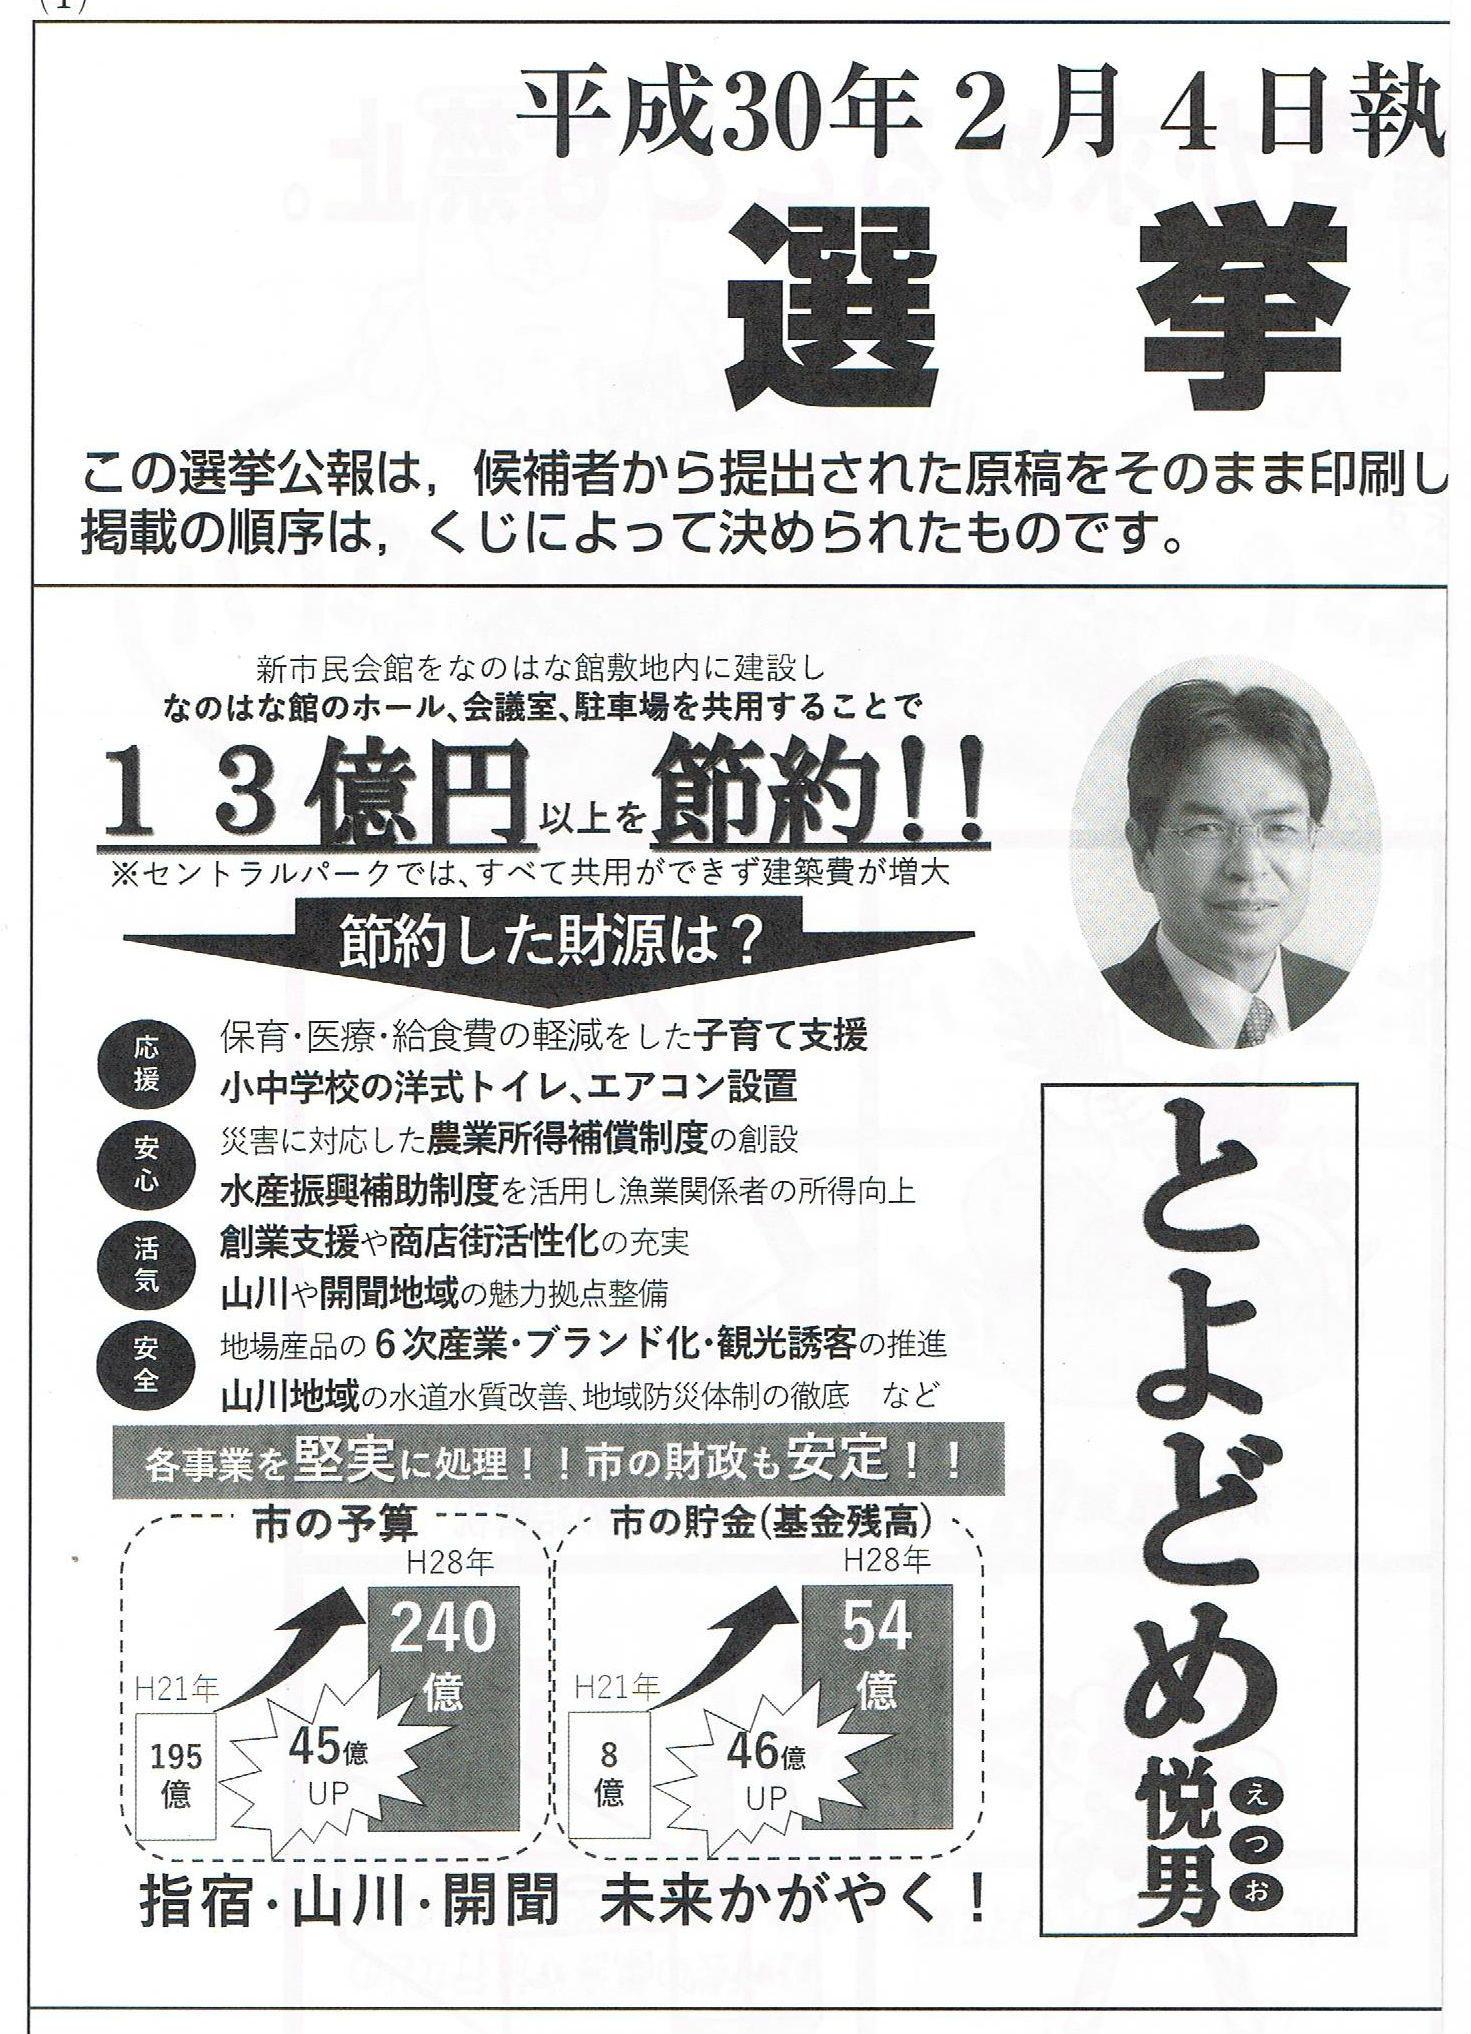 http://hunter-investigate.jp/news/771168c51dfb8b54097ab15a252c028270d31c2b.jpg